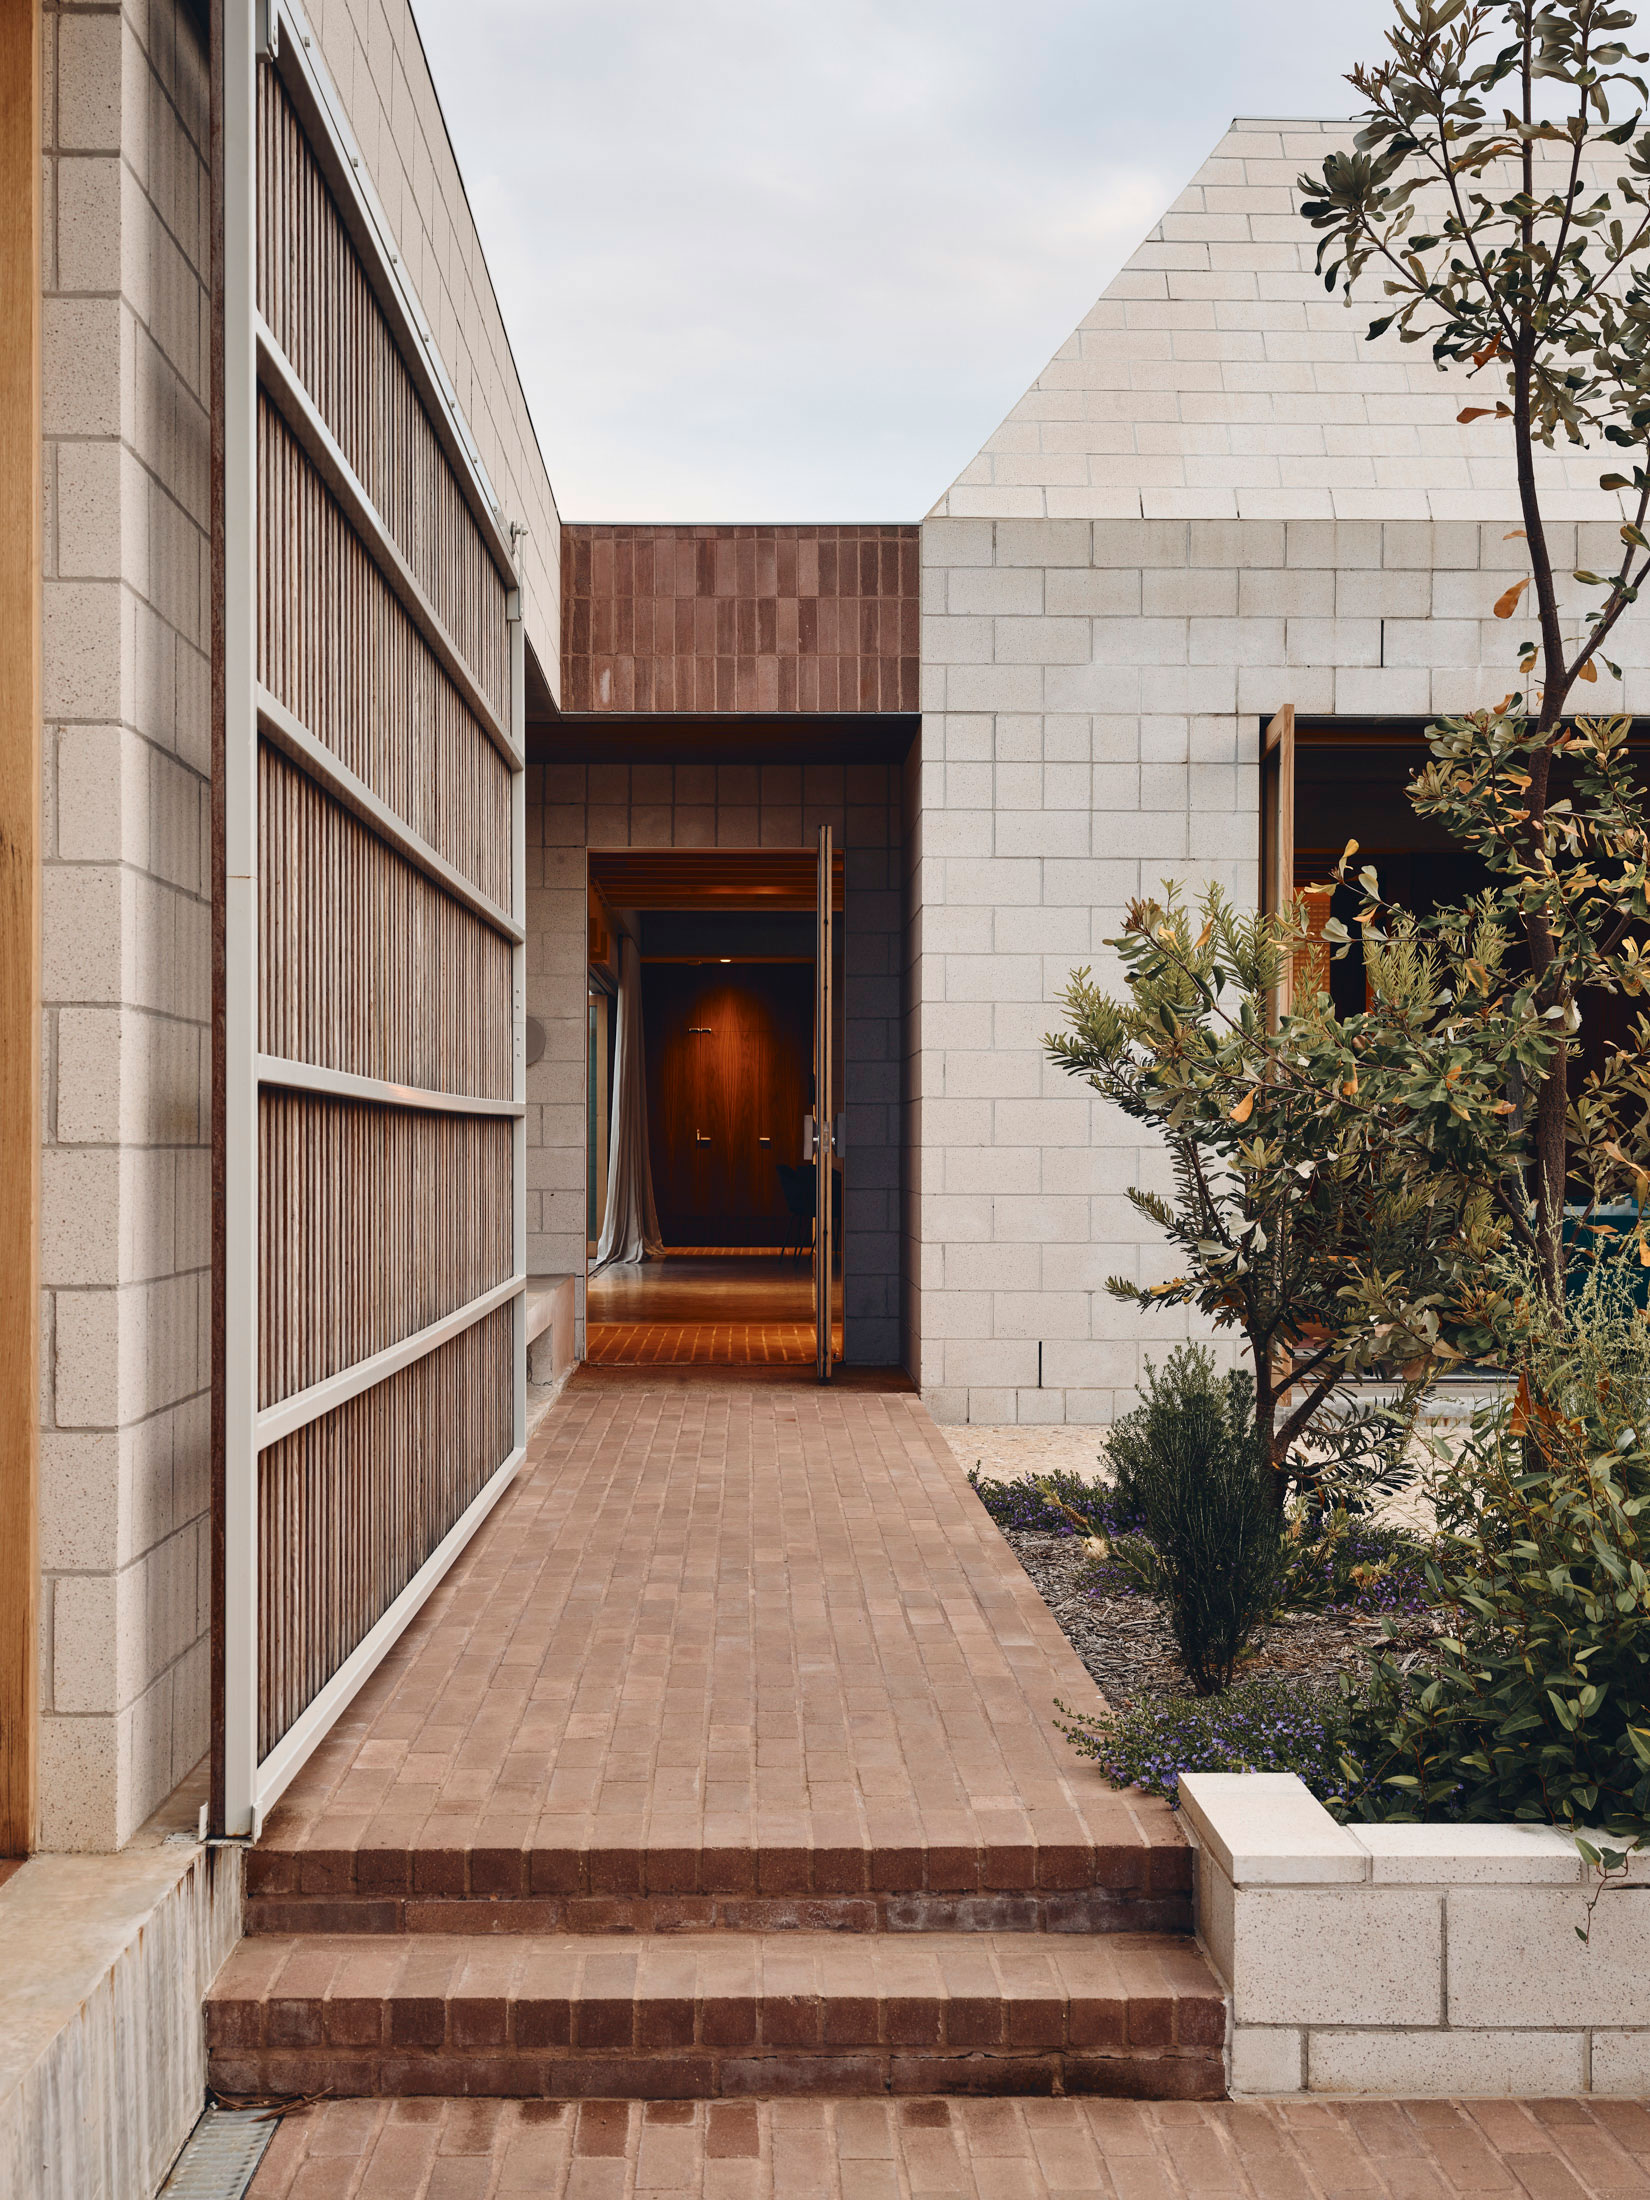 Architects Eat Bellows Beach House Flinders Masonry Architecture Photo Derek Swalwell Yellowtrace 58